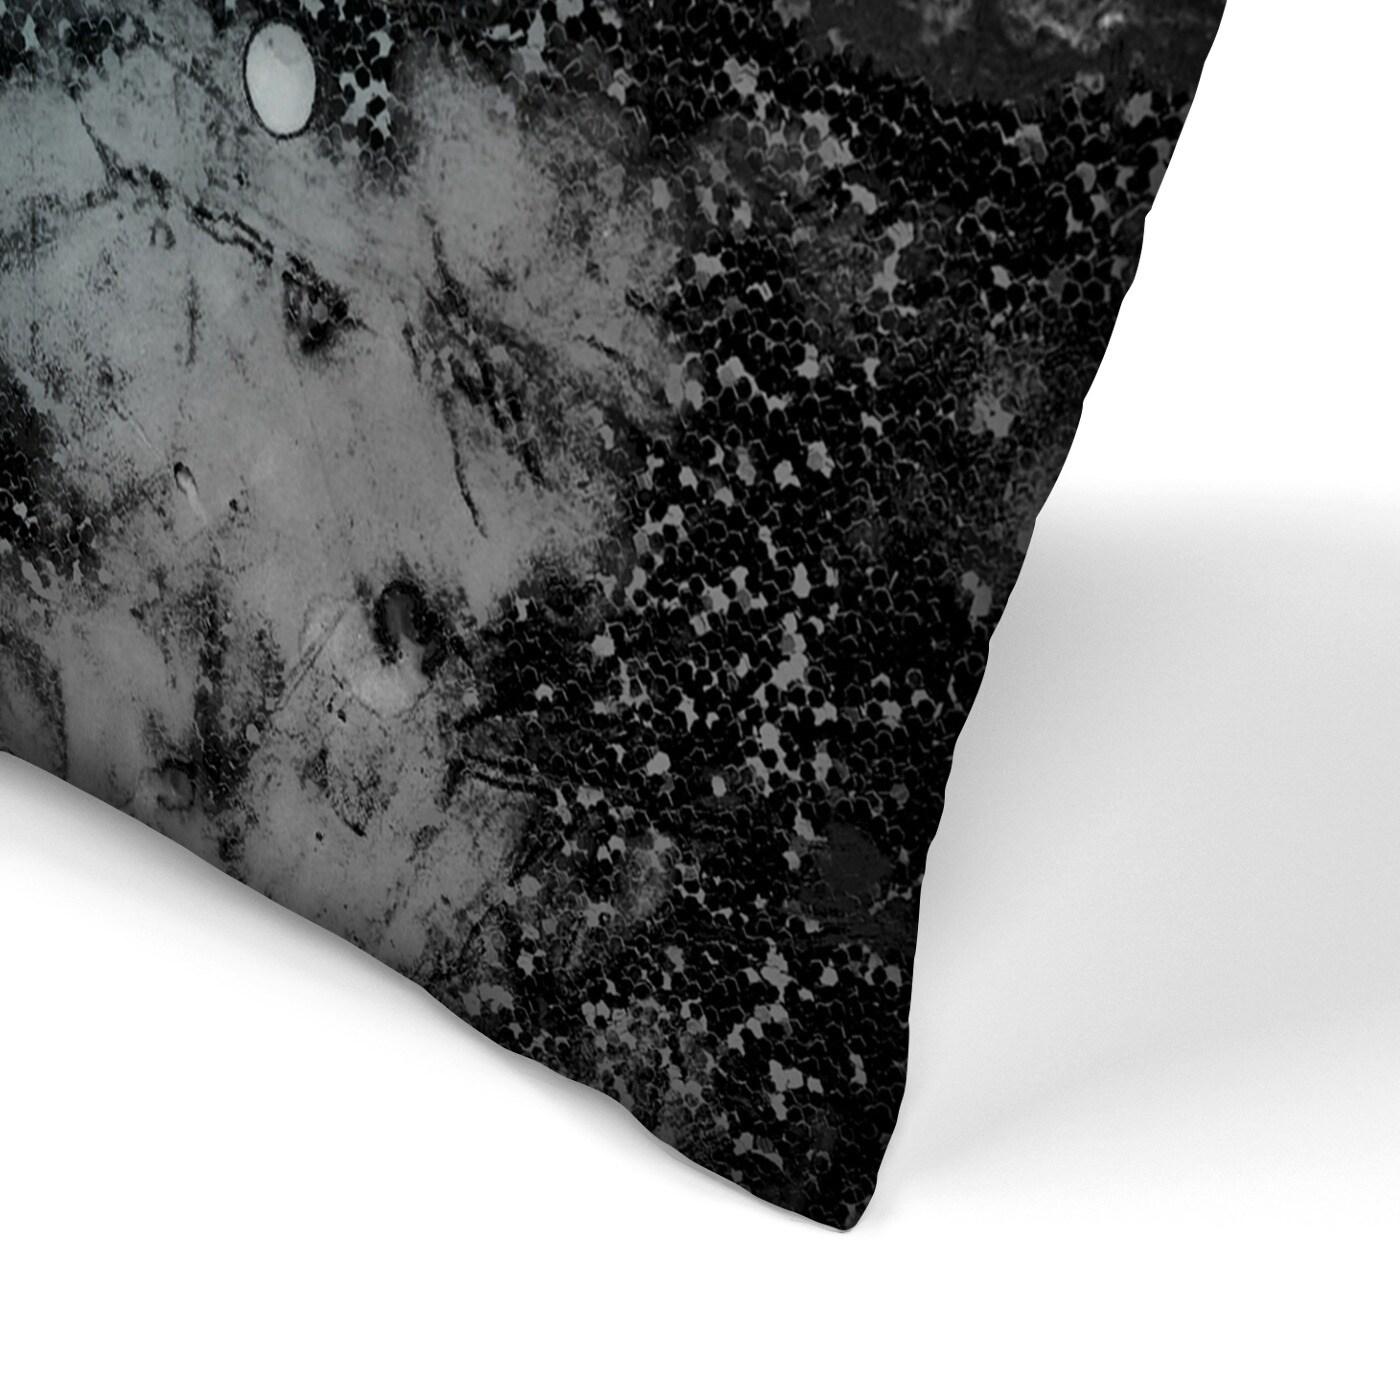 Luxury Dark Malachite Gold Gem Agate And Marble Texture Overstock 31034282